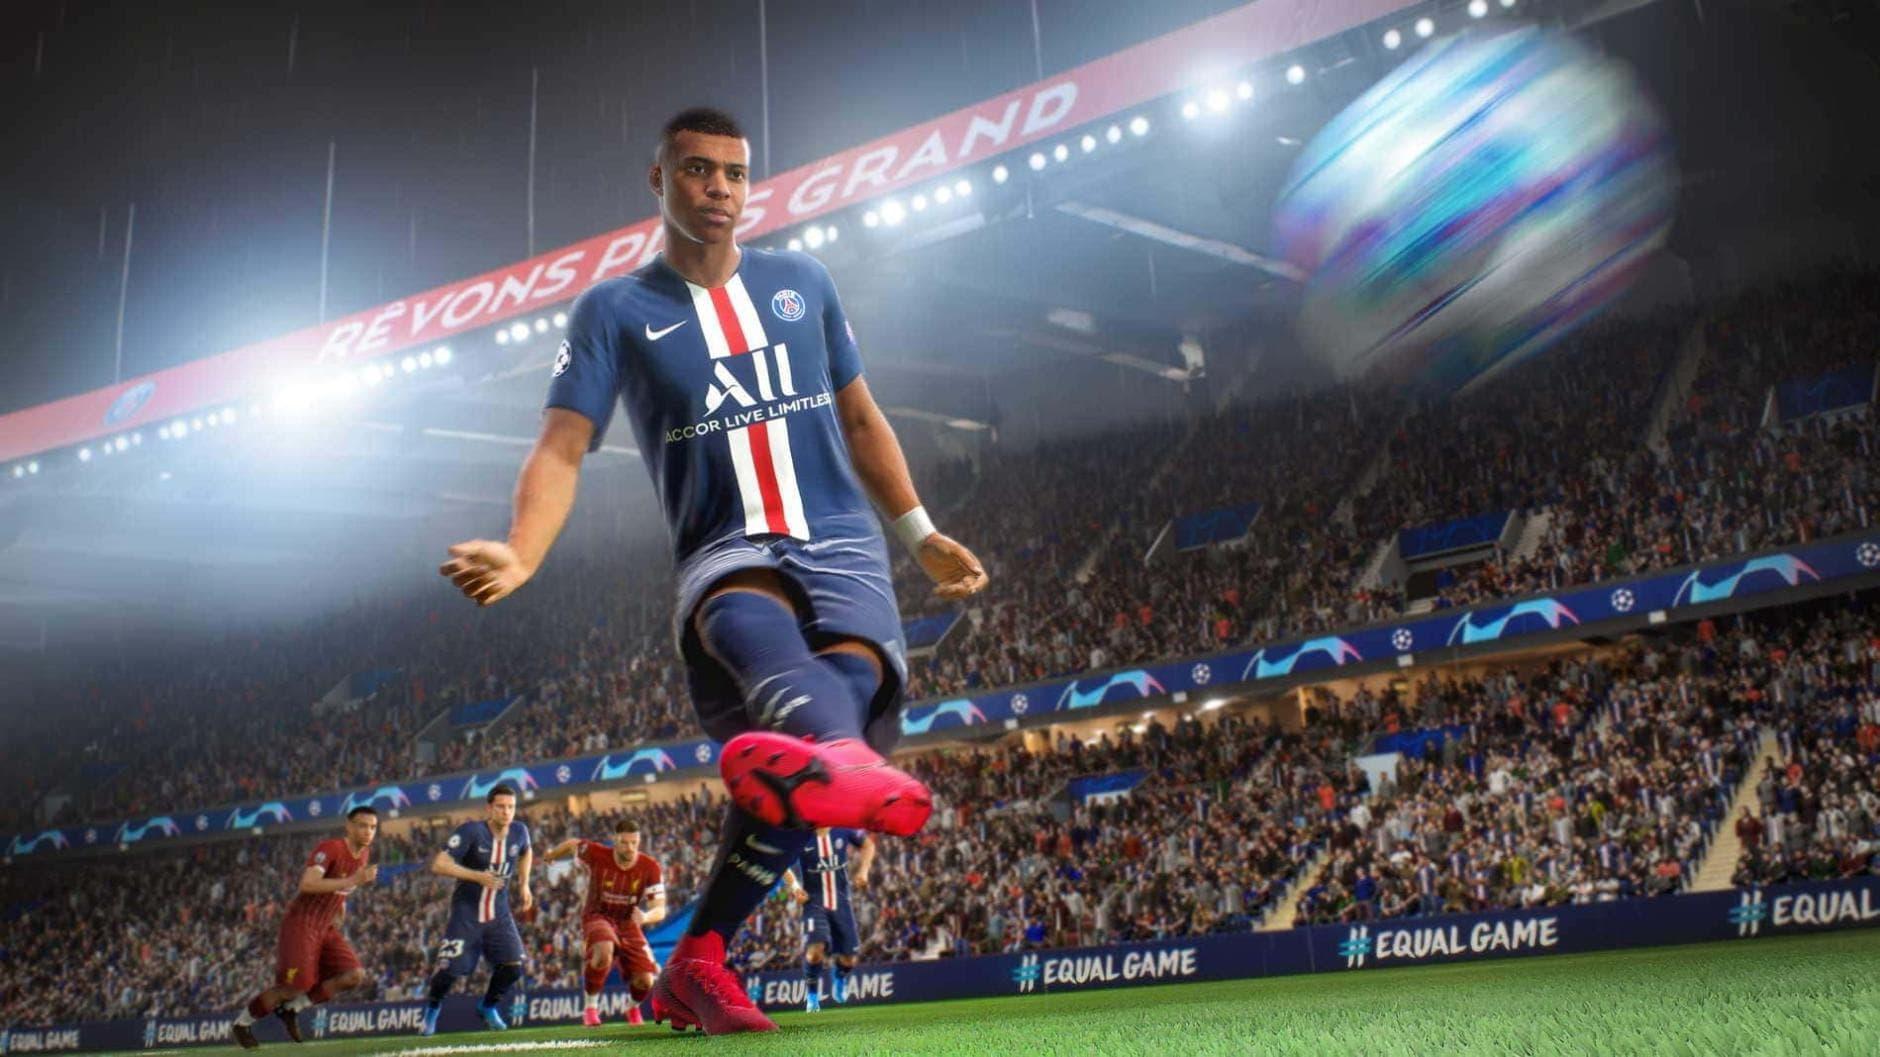 FIFA 21 Kylian Mbappe BS 2